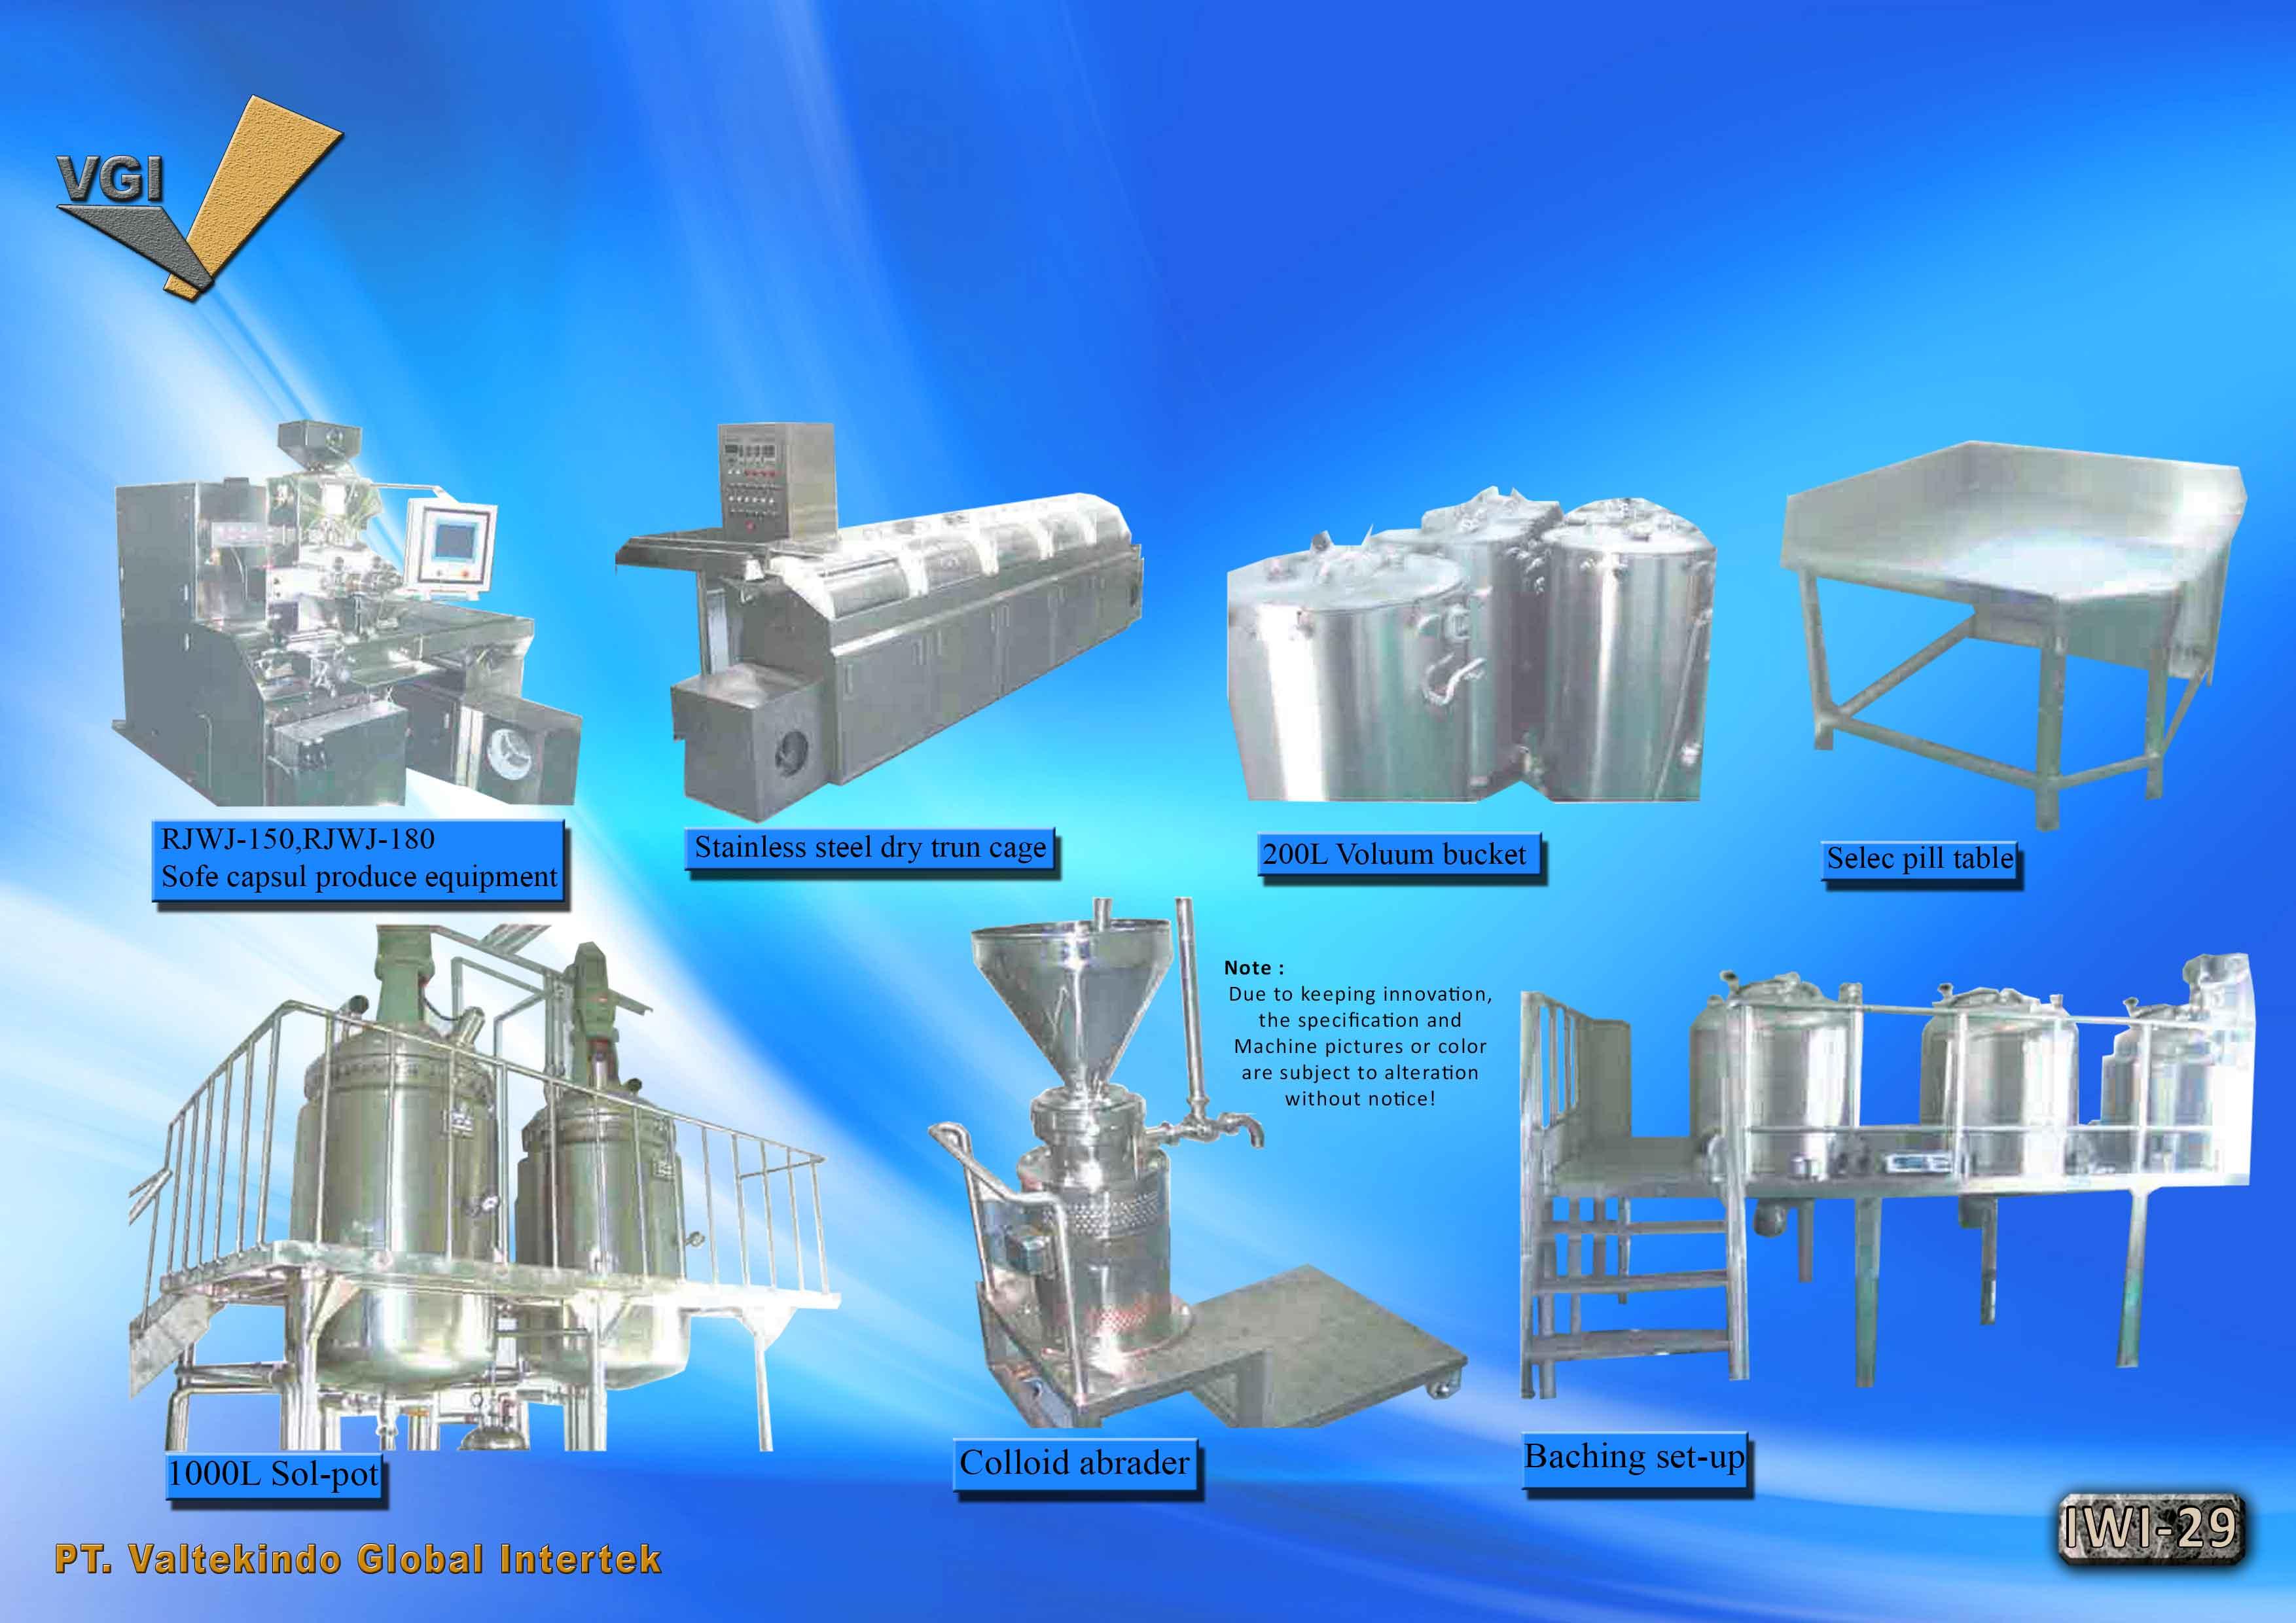 jual mesin Soft Capsule Produce Equipment8 Soft Capsule Produce Equipment8